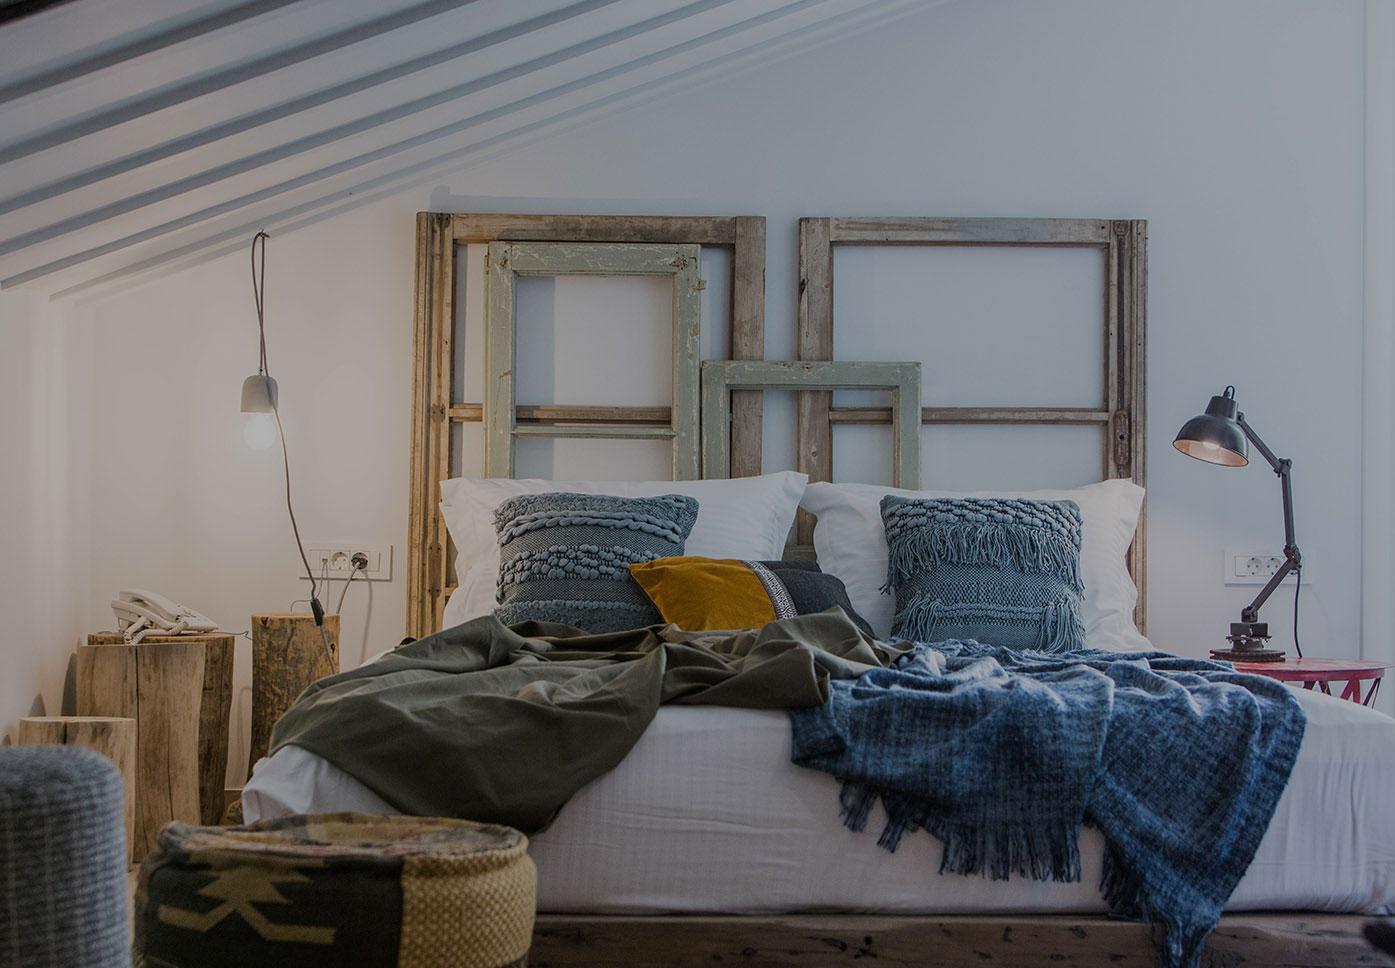 nafplio hotels - Amymone Suites